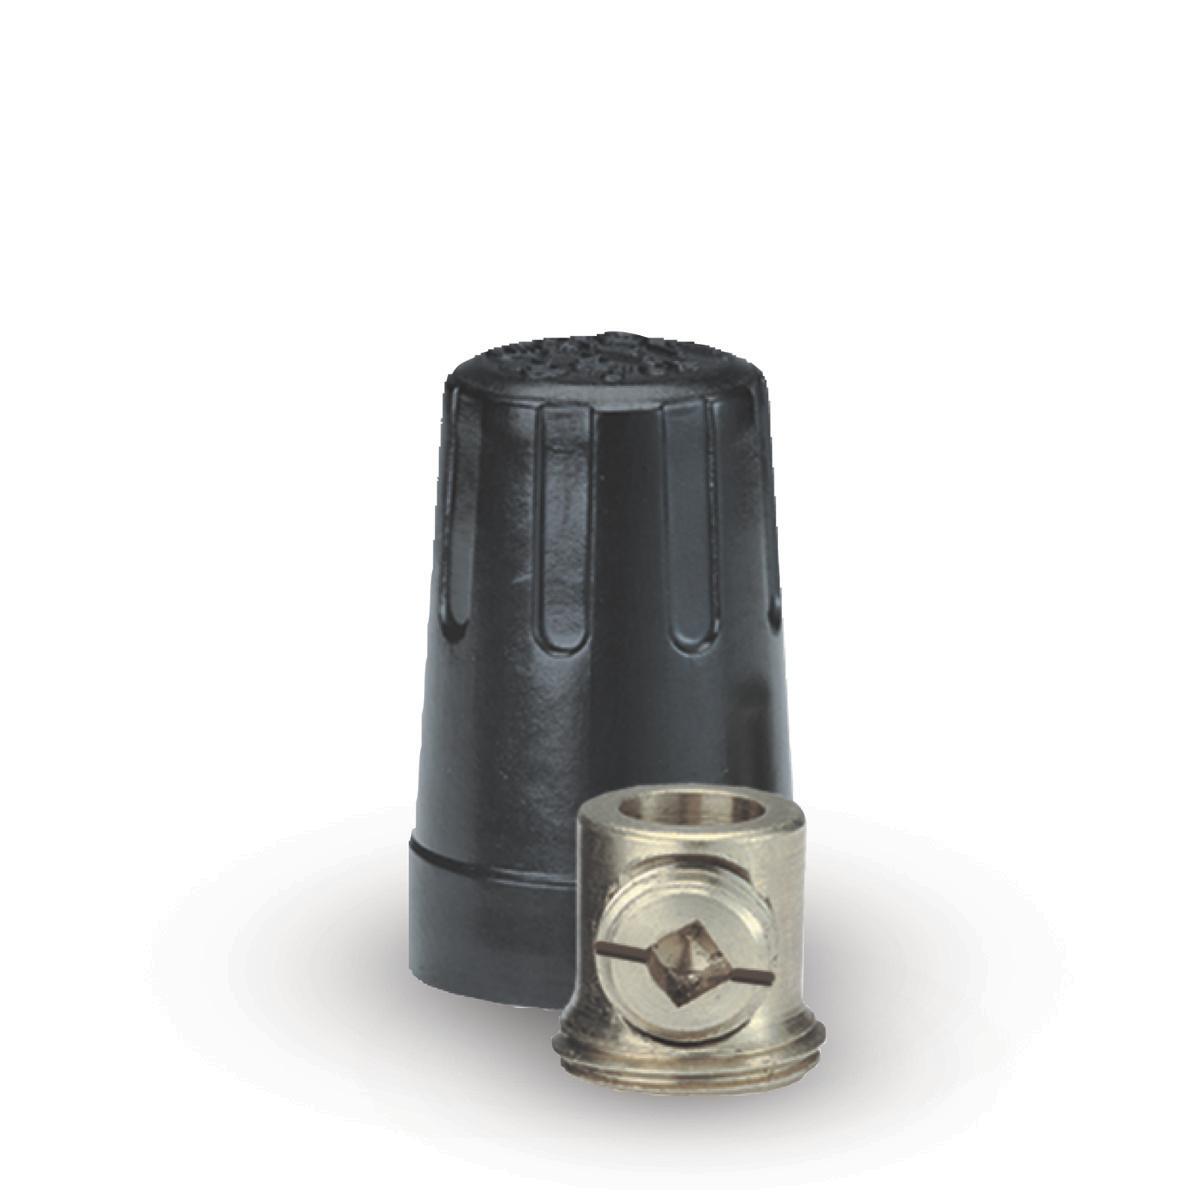 SET SCREW 2P CONN & CAP